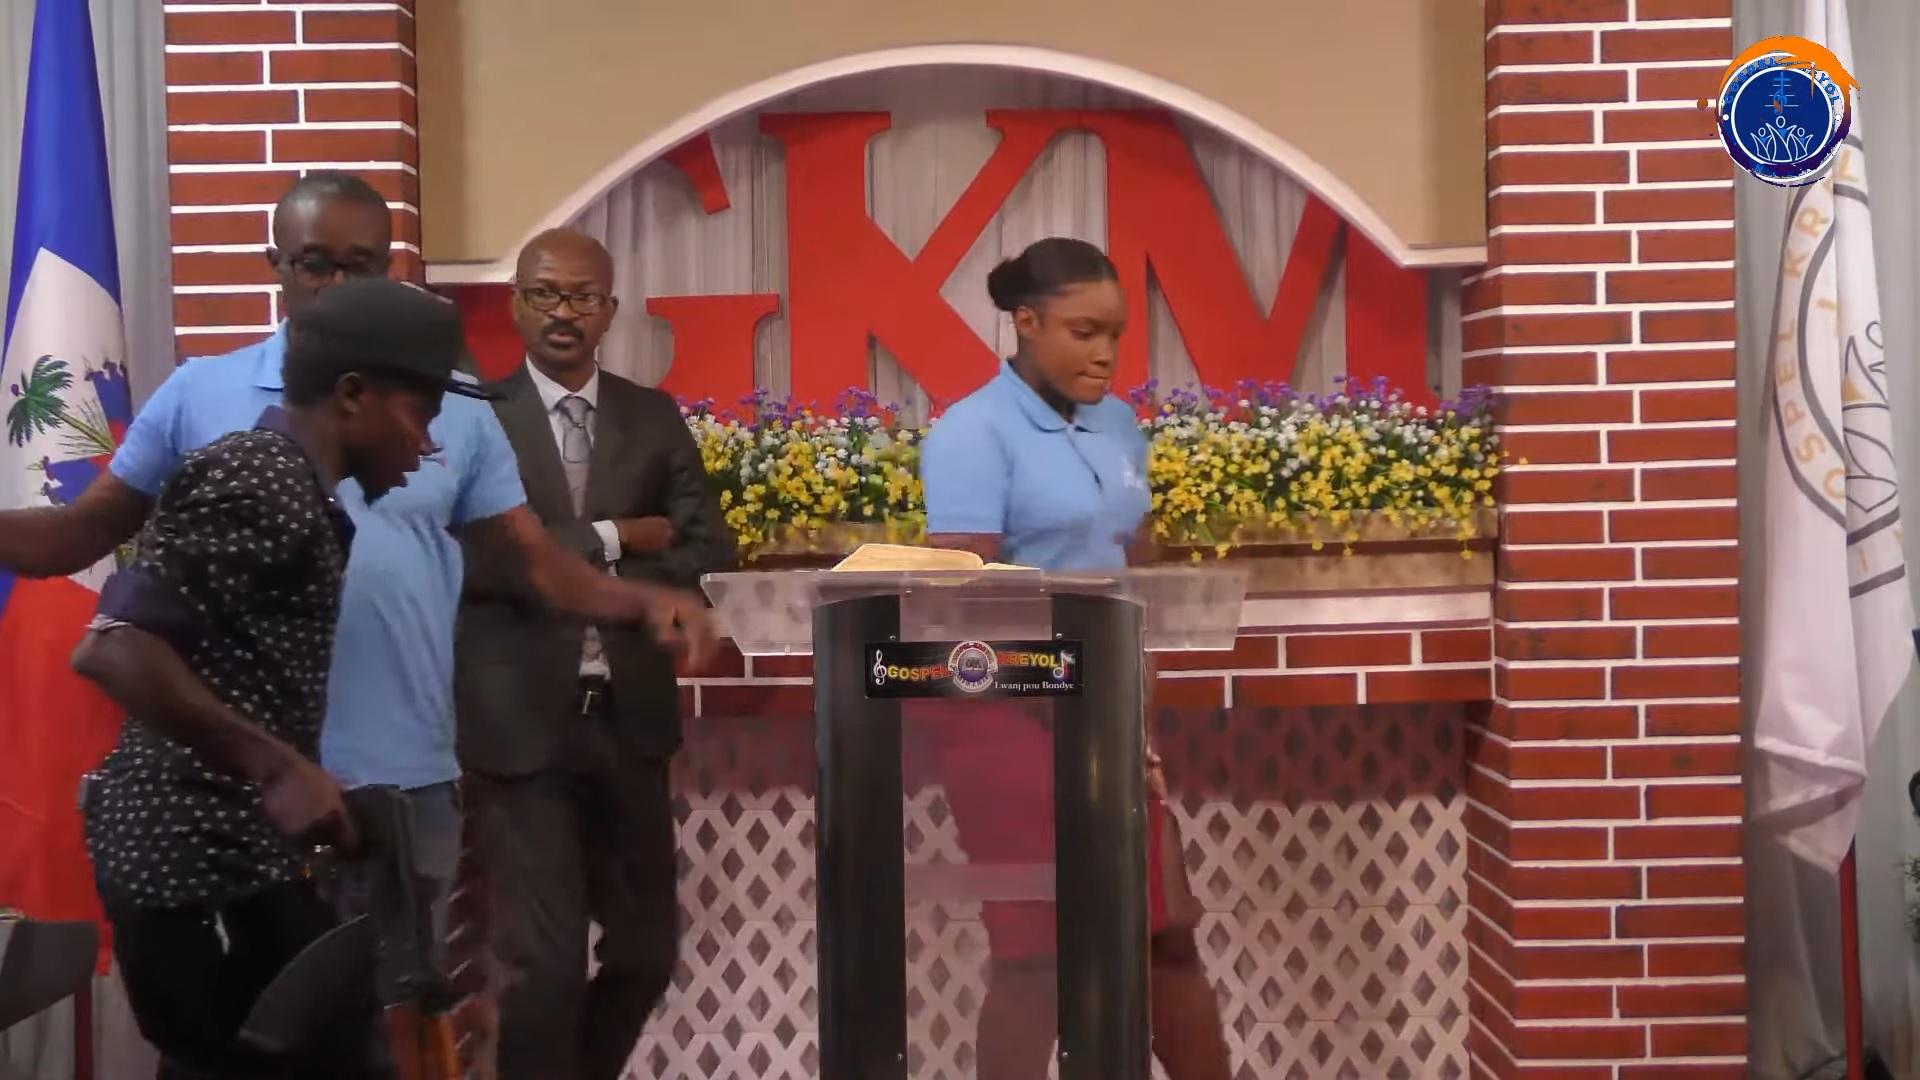 Боевики похитили пастора на Гаити во время прямой трансляции